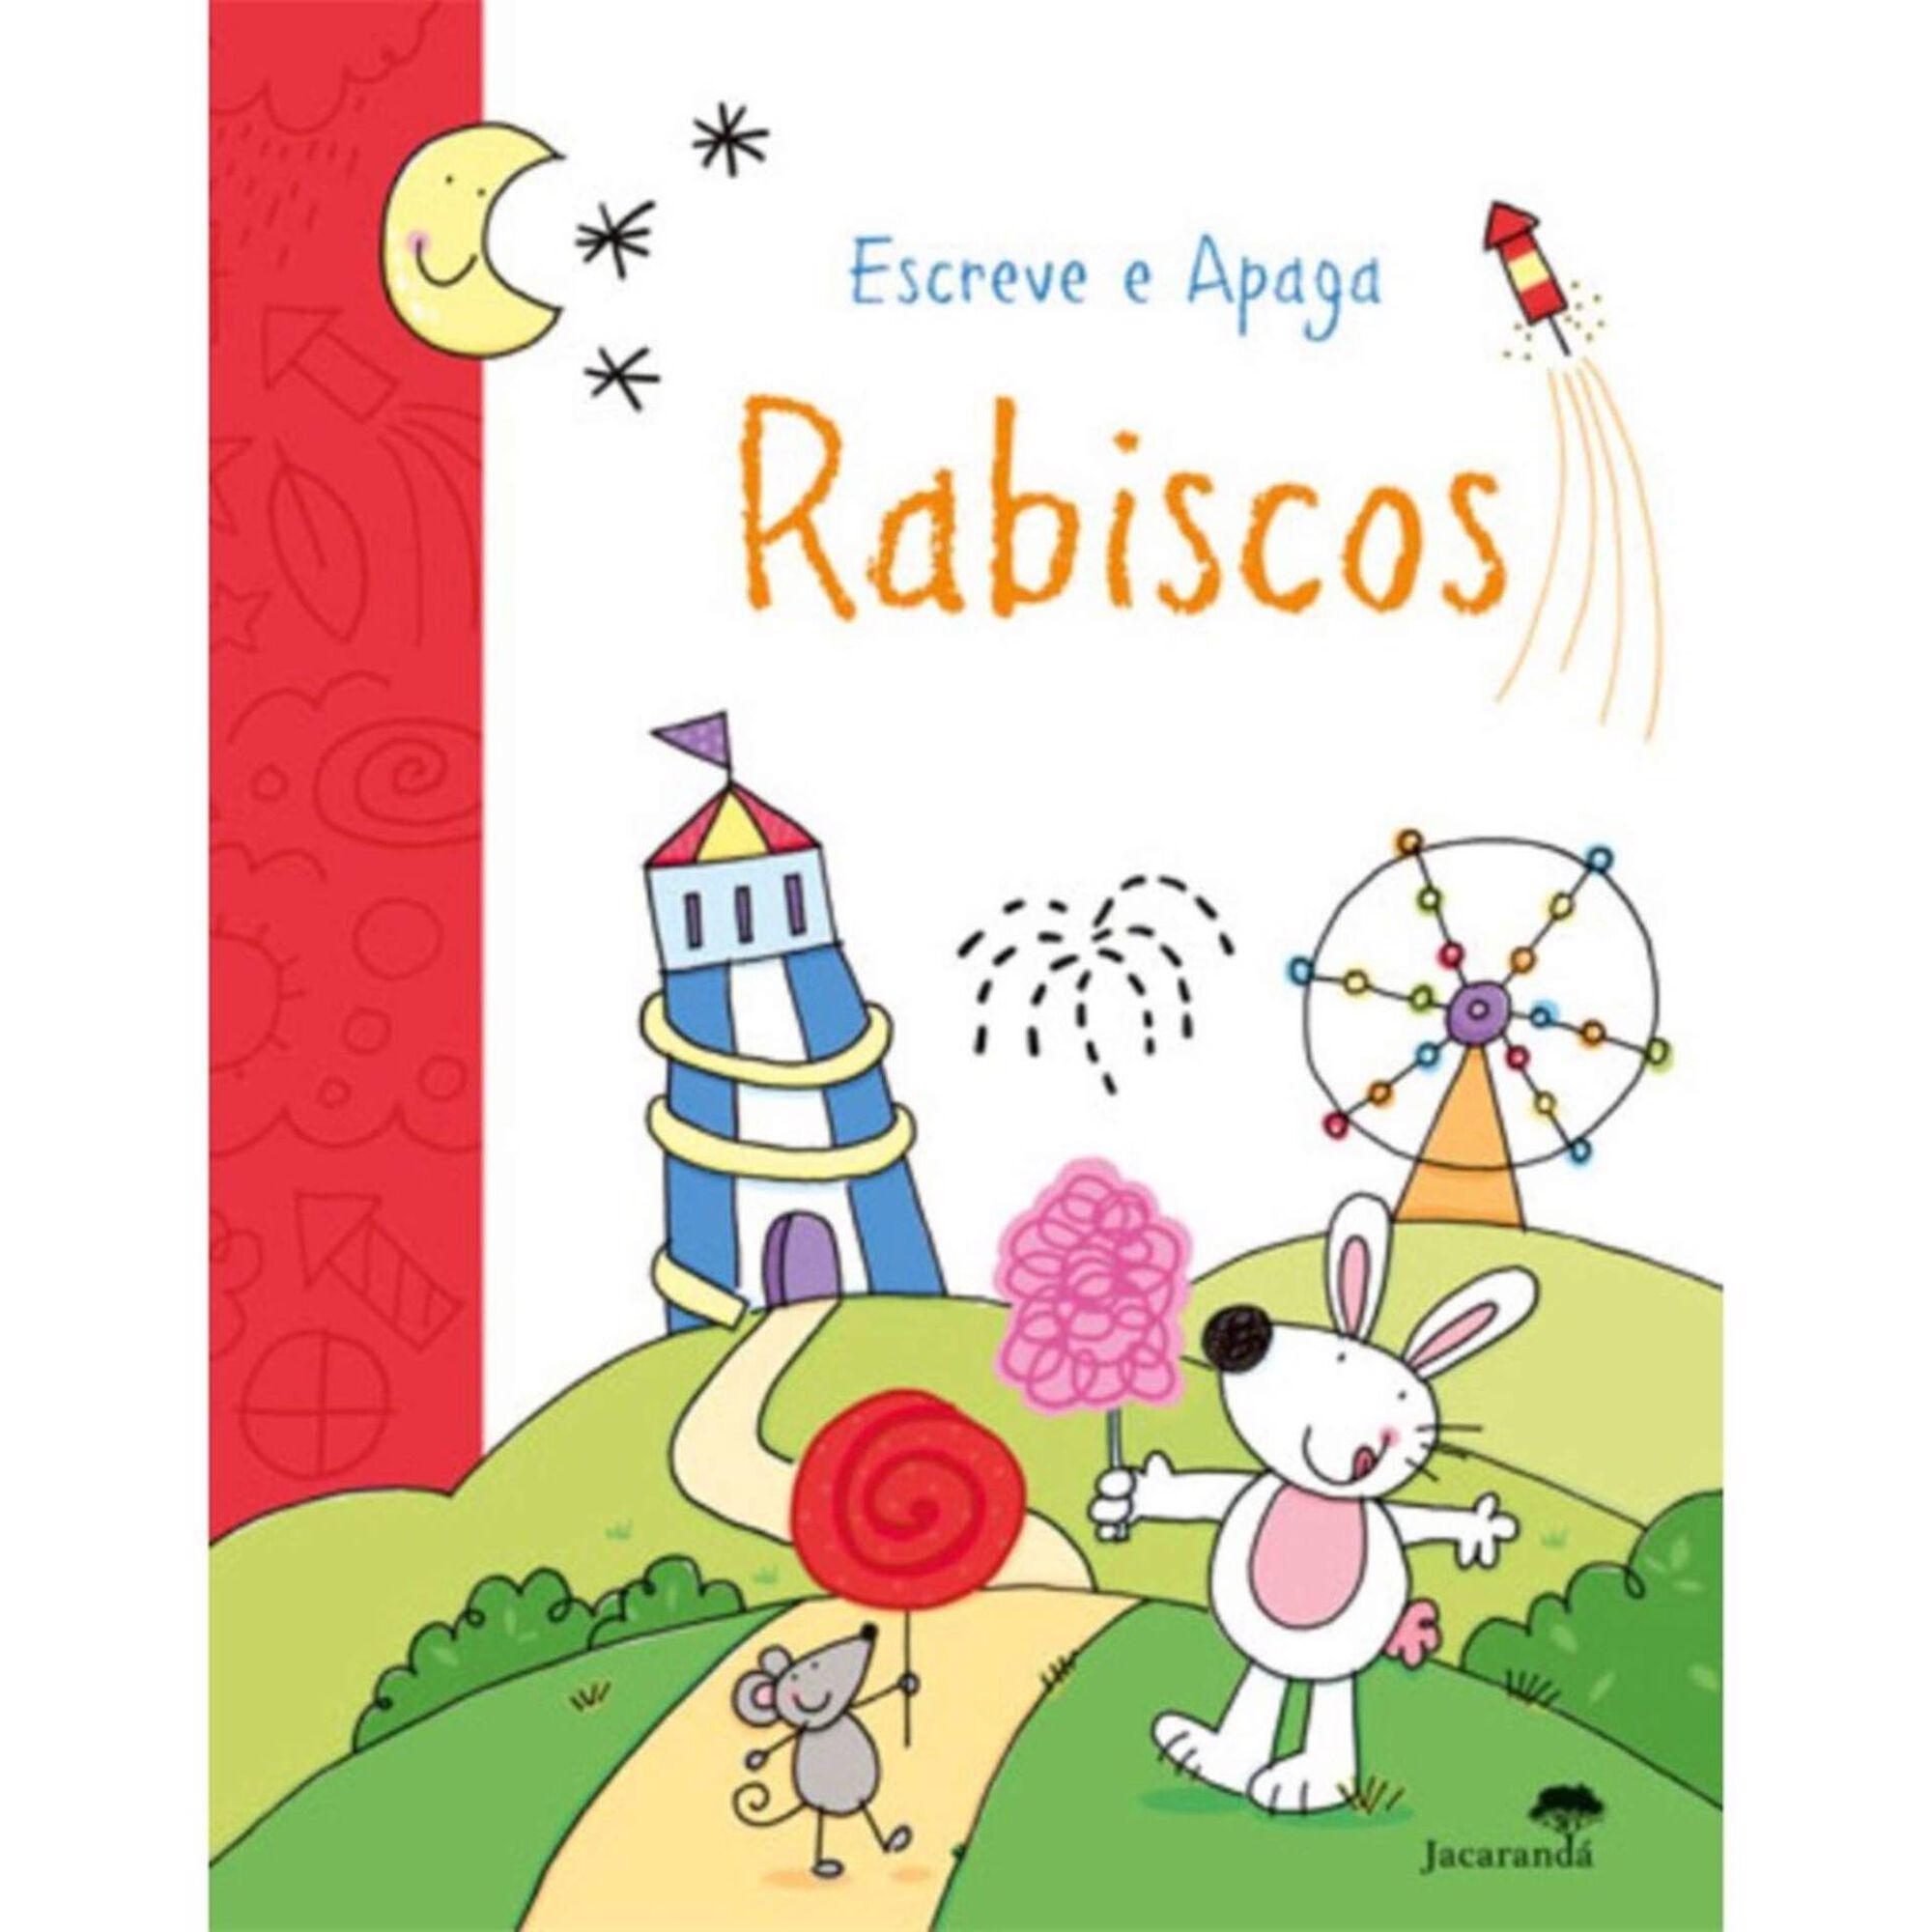 Escreve e Apaga - Rabiscos